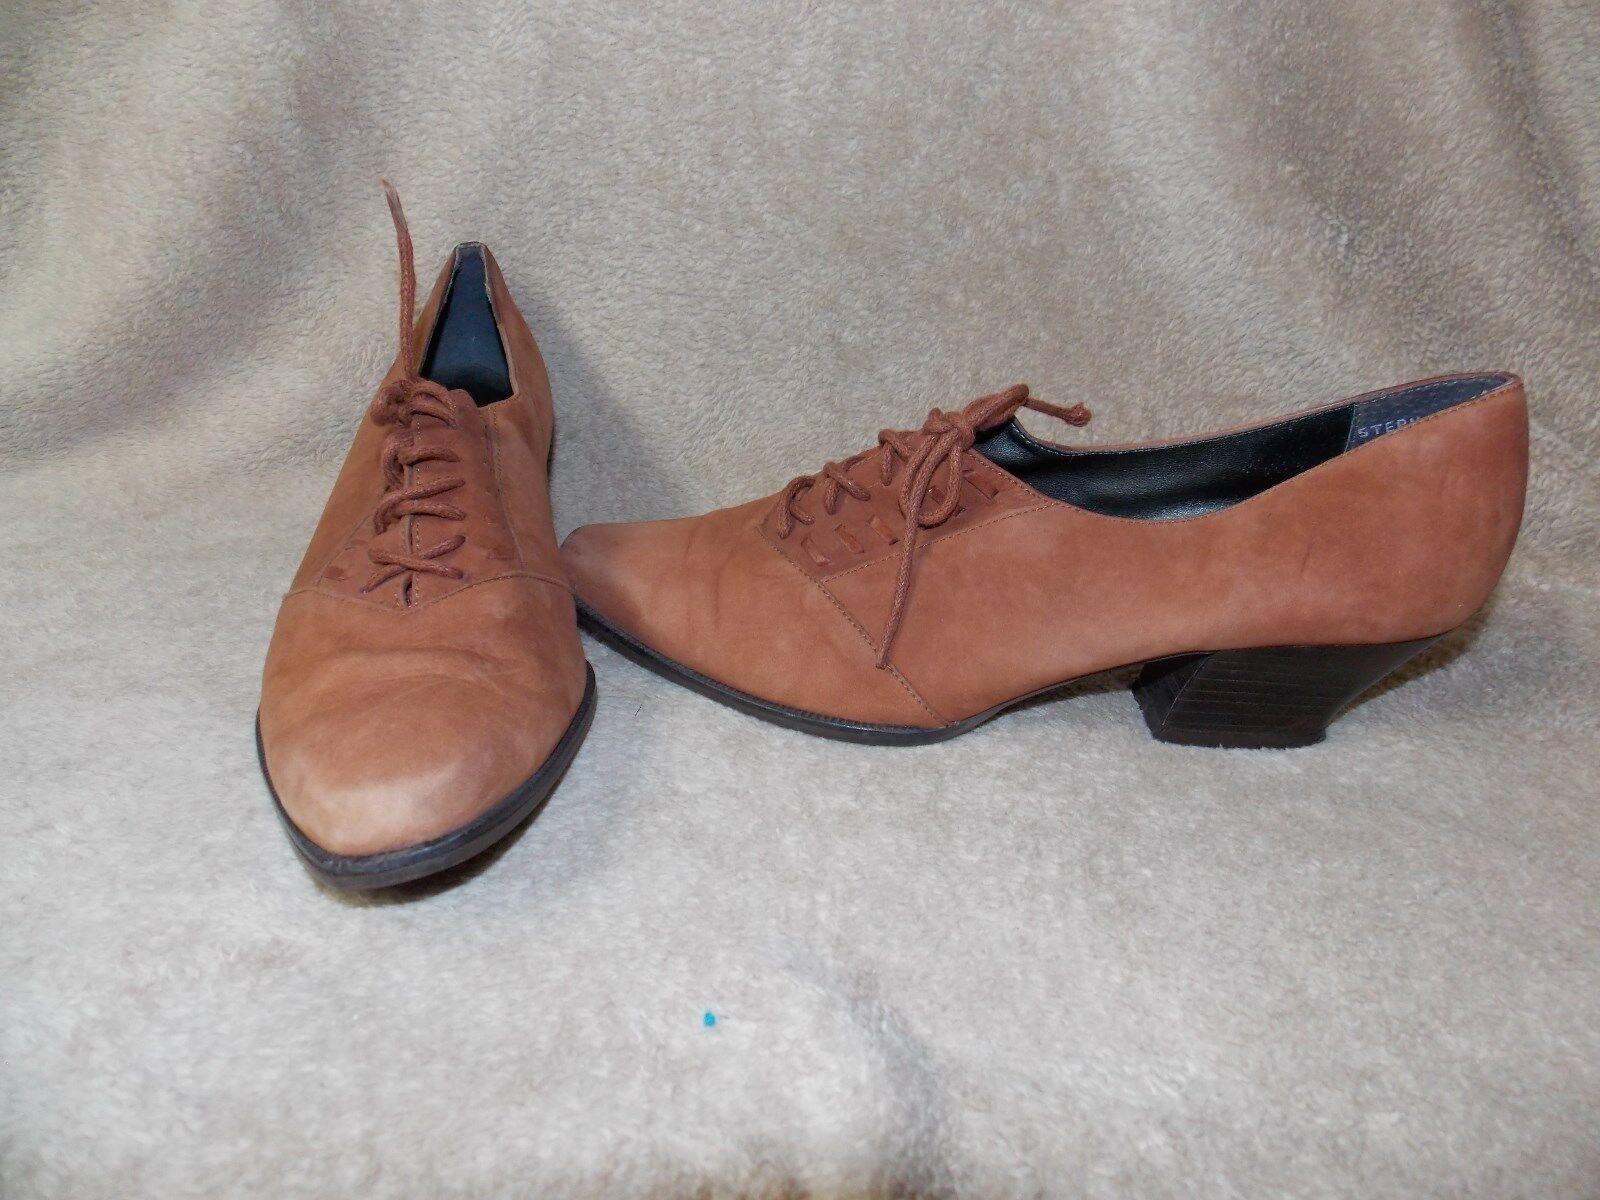 Nicole RUST Retro Grany Boho Low Heels 9M Used